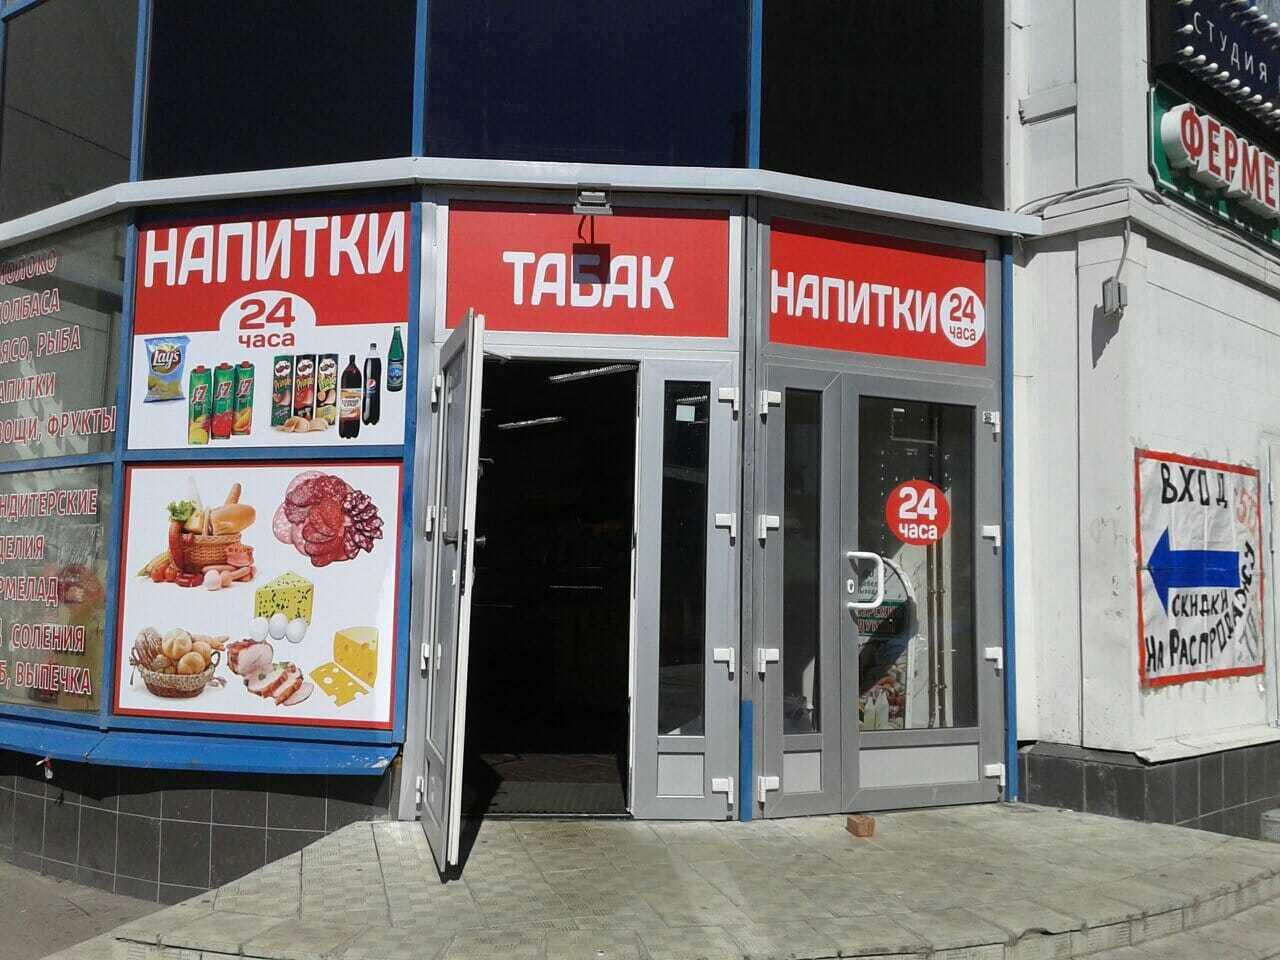 Витрина продуктового магазина